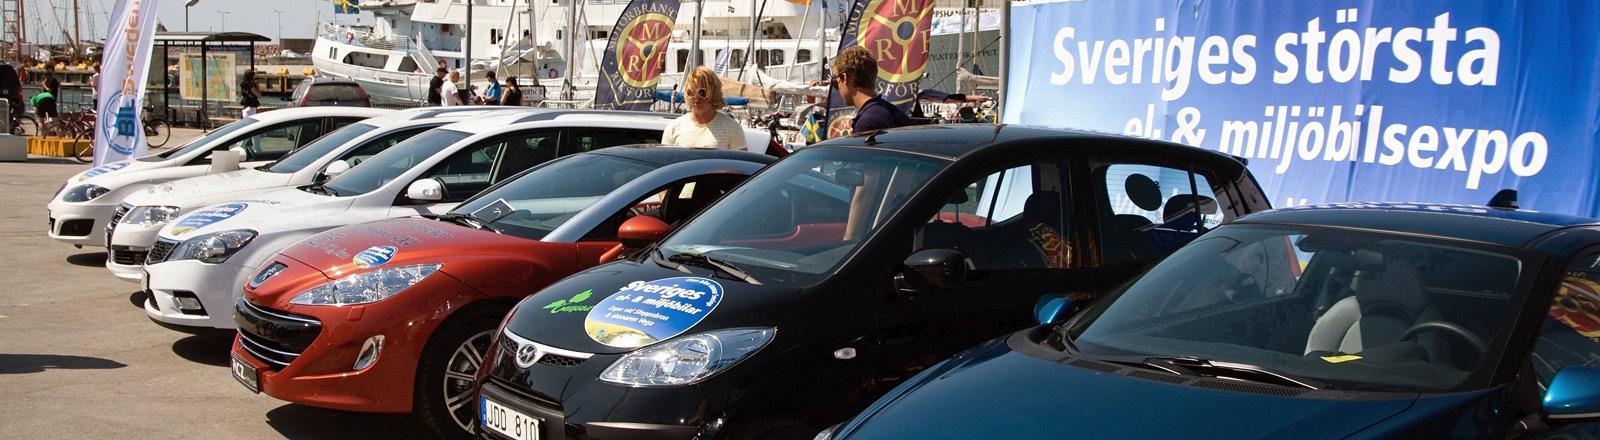 Geparkte Autos in Schweden.